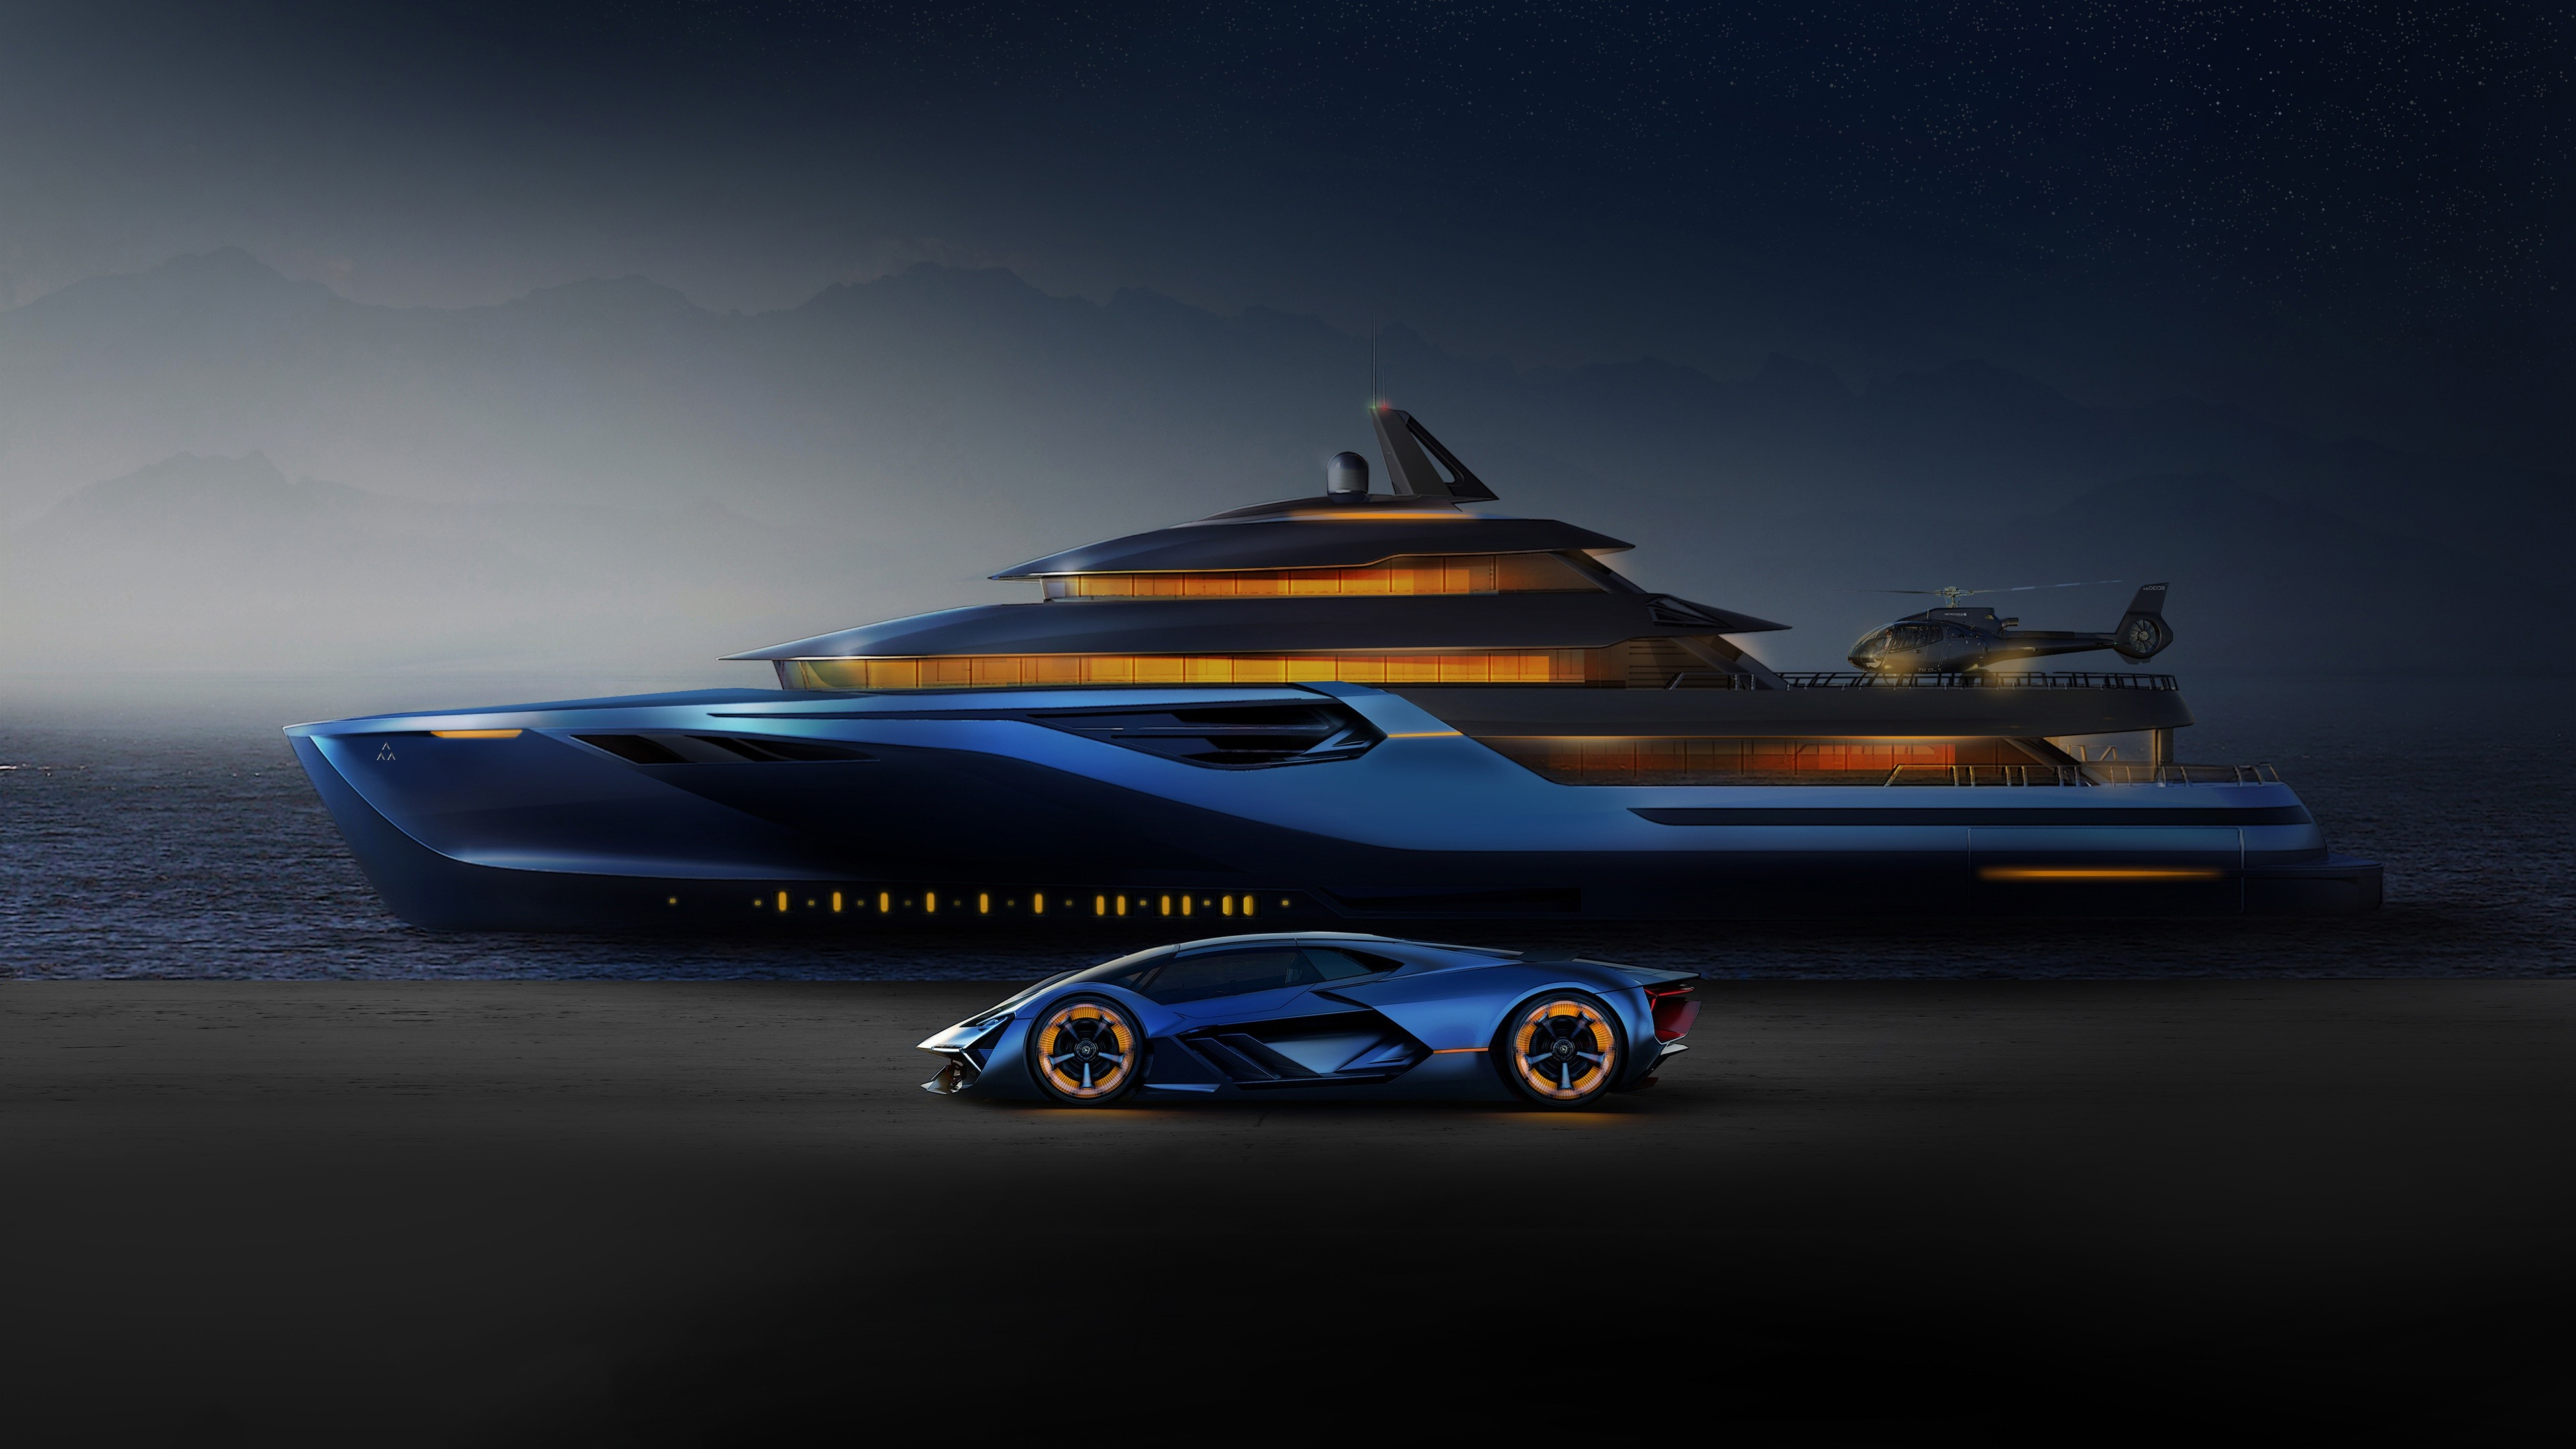 Wallpaper Blue Lamborghini, yacht, helicopter 3840x2160 UHD